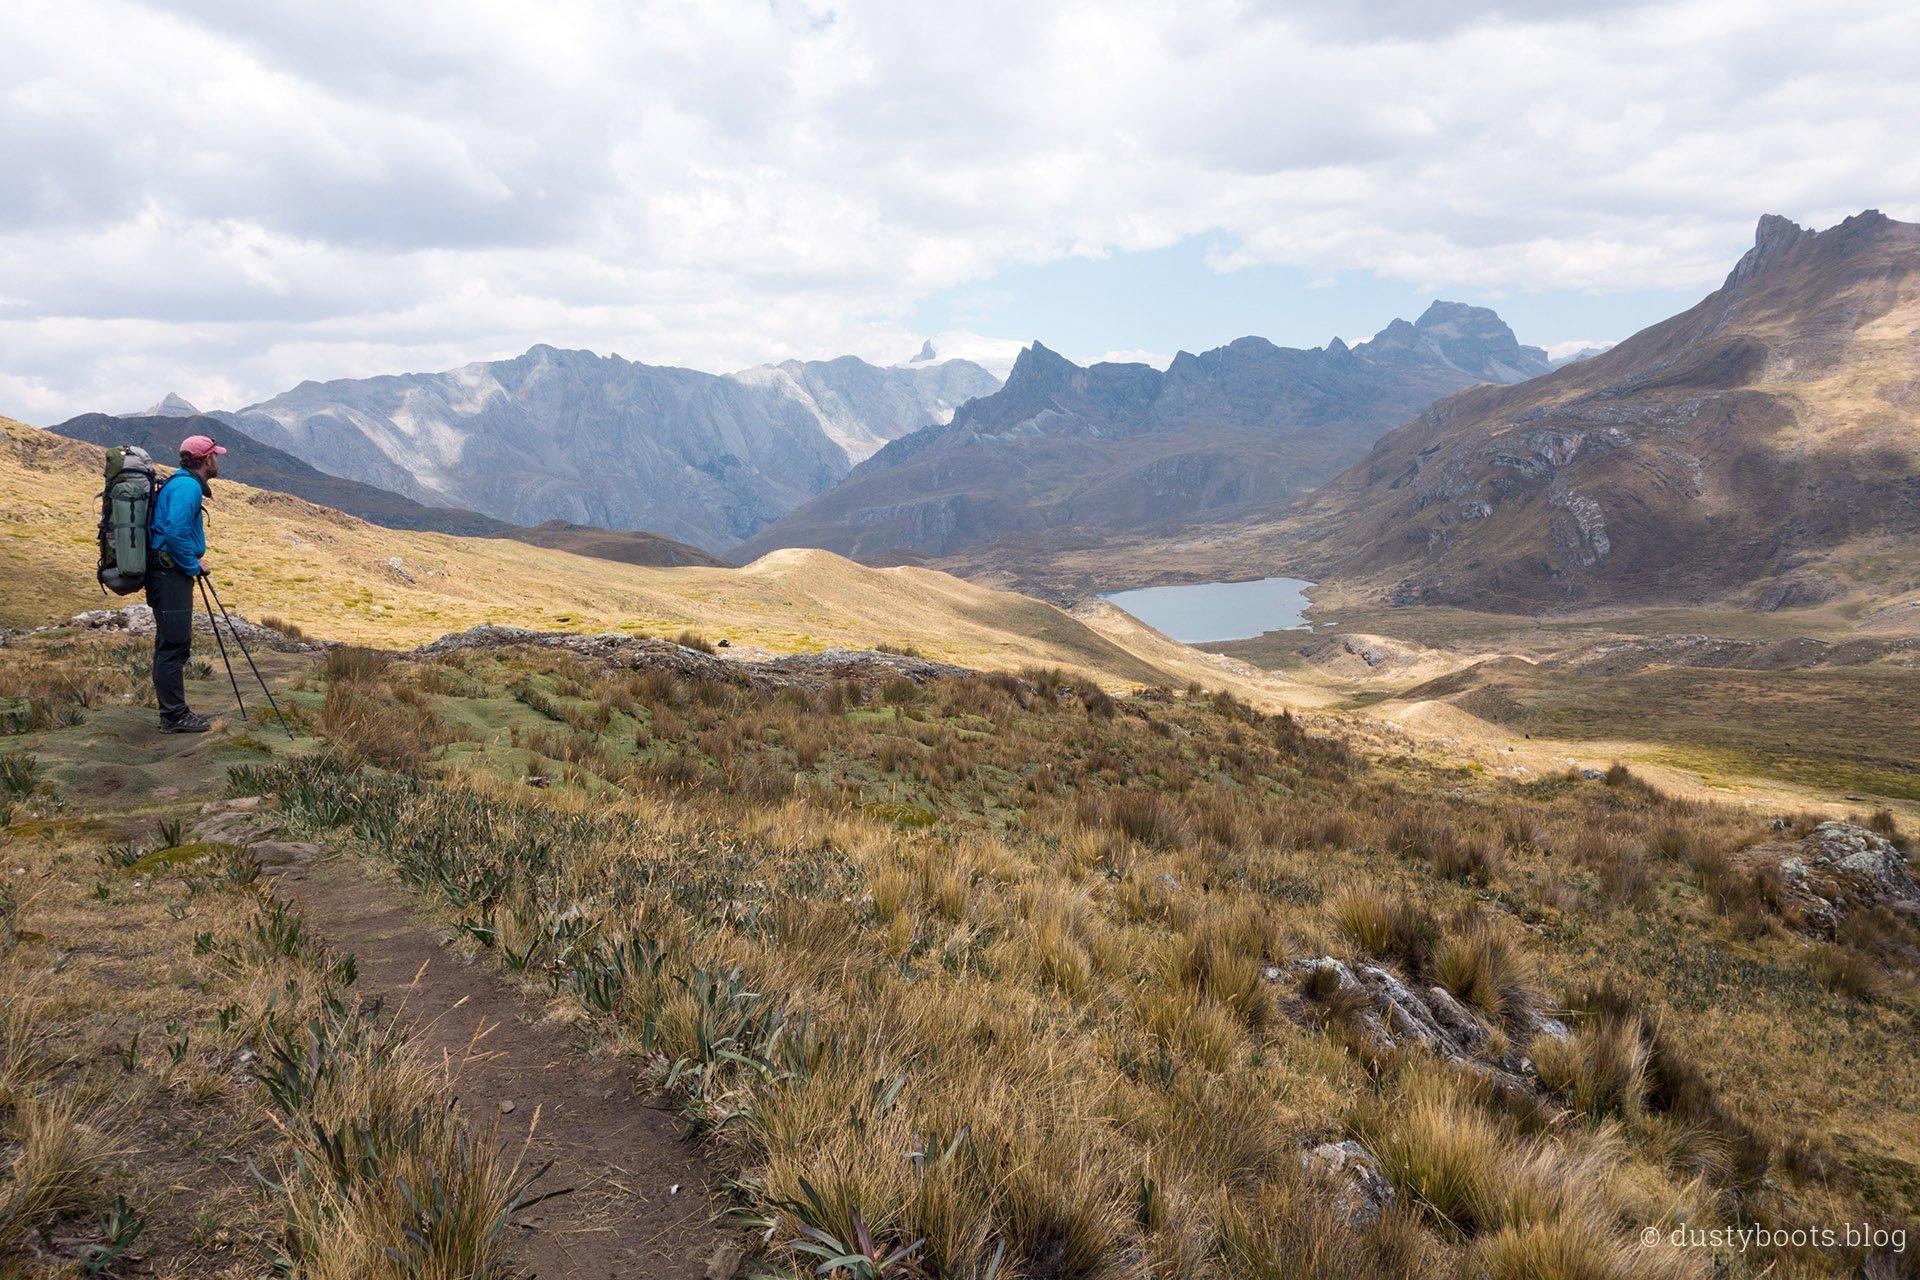 Tag 4: Abstieg zum Camp Huayhuash